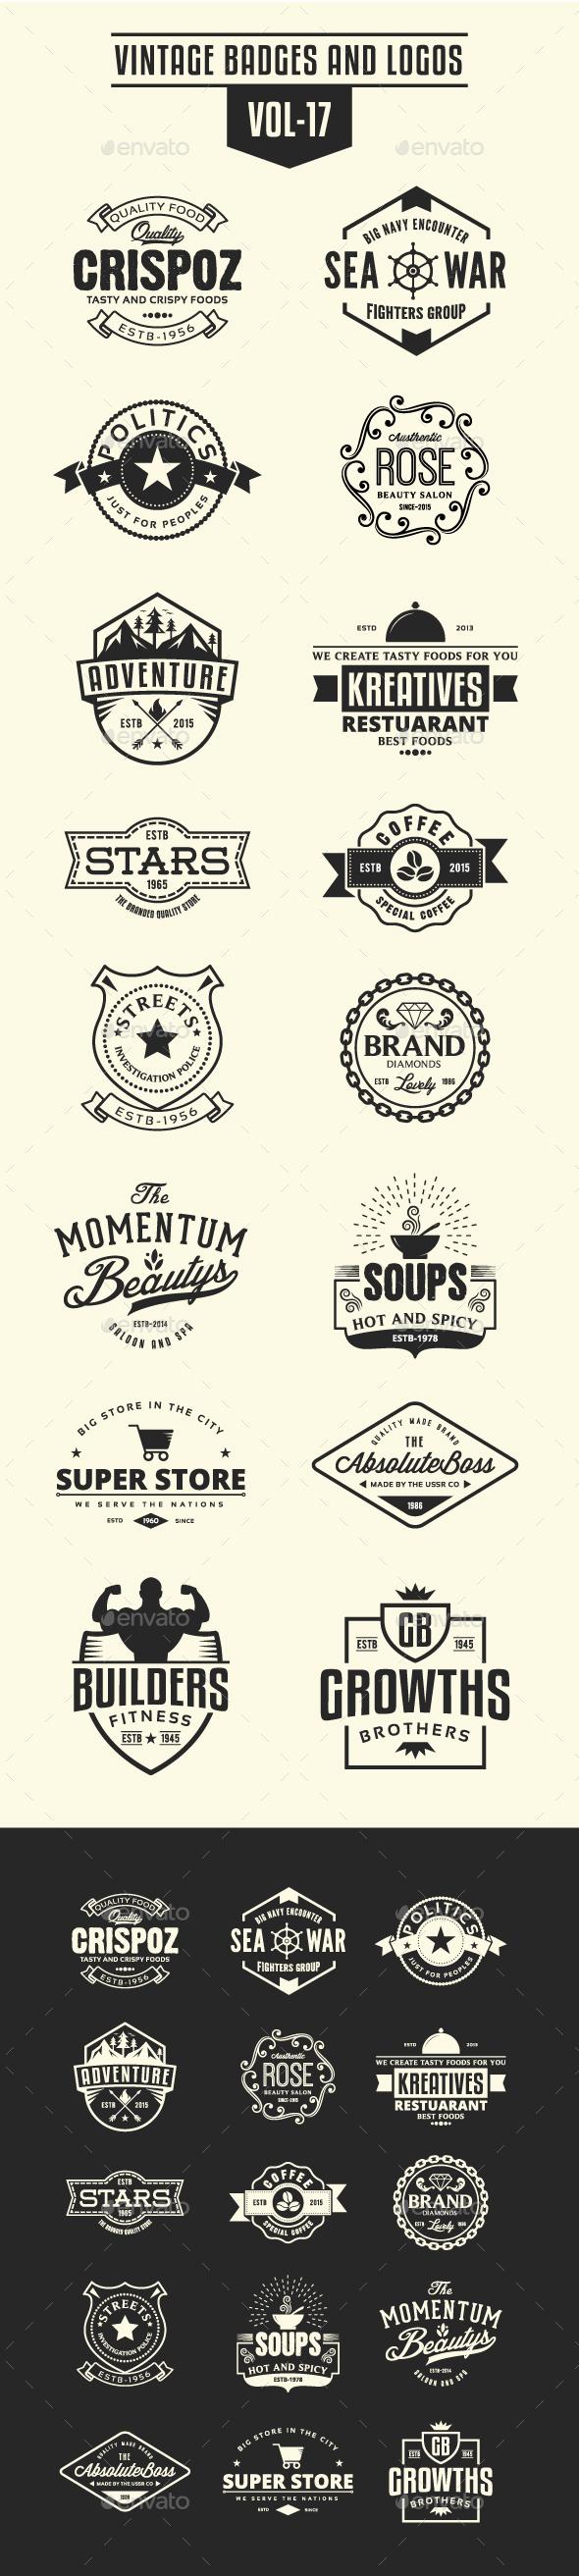 Vintage Badges and Logos Vol-17 - Badges & Stickers Web Elements